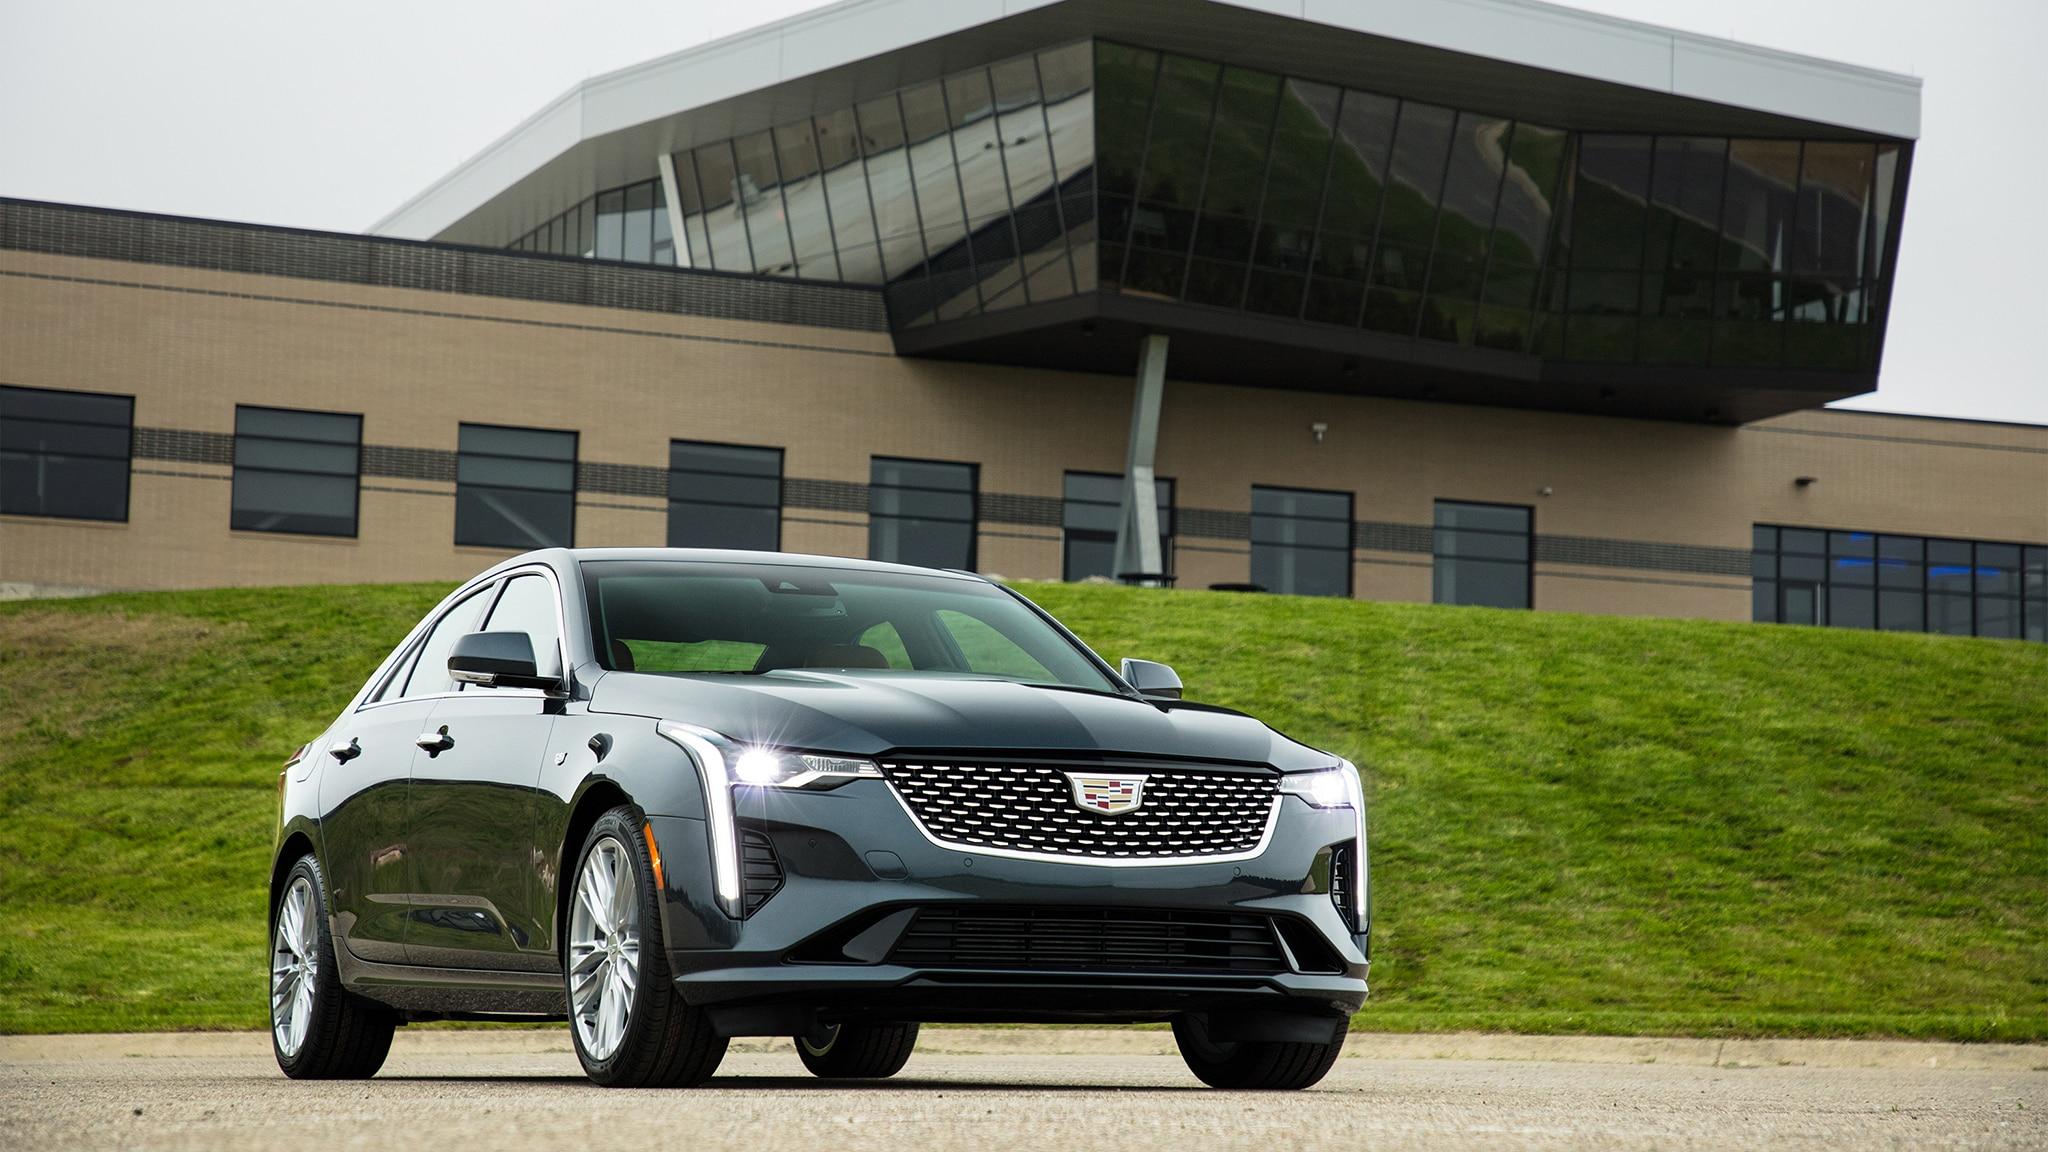 2020 Cadillac CT4: The Regular Ol' Non-V Models Are Here | Automobile Magazine